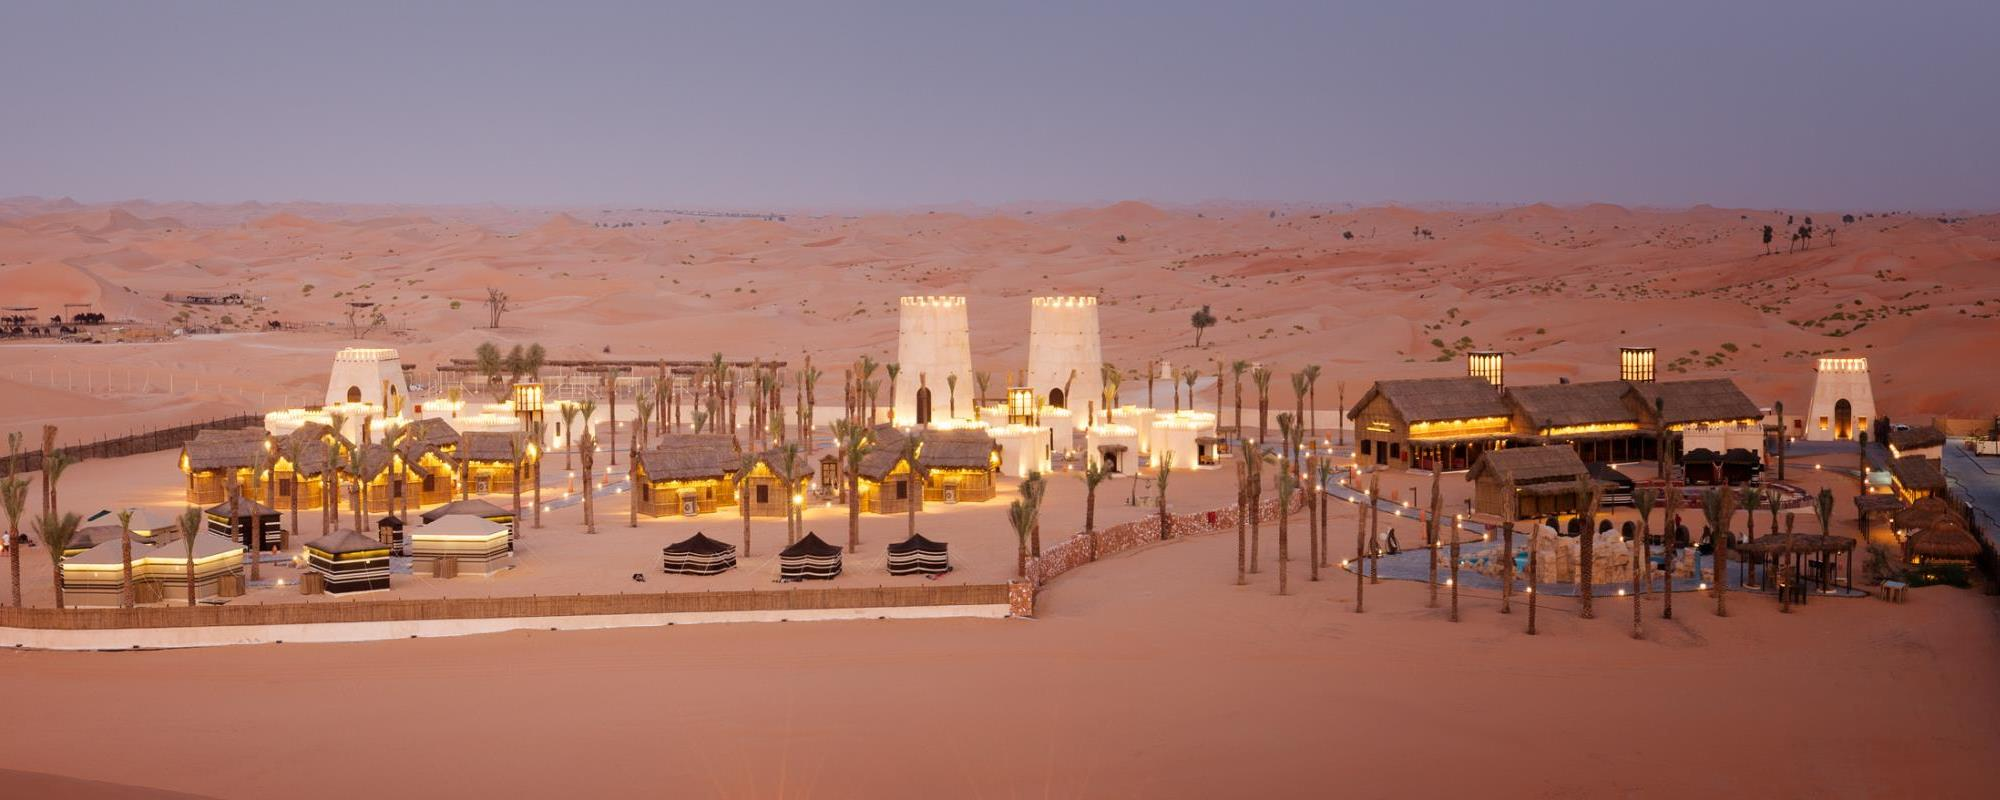 Arabian Nights Village - VisitAbuDhabi.ae